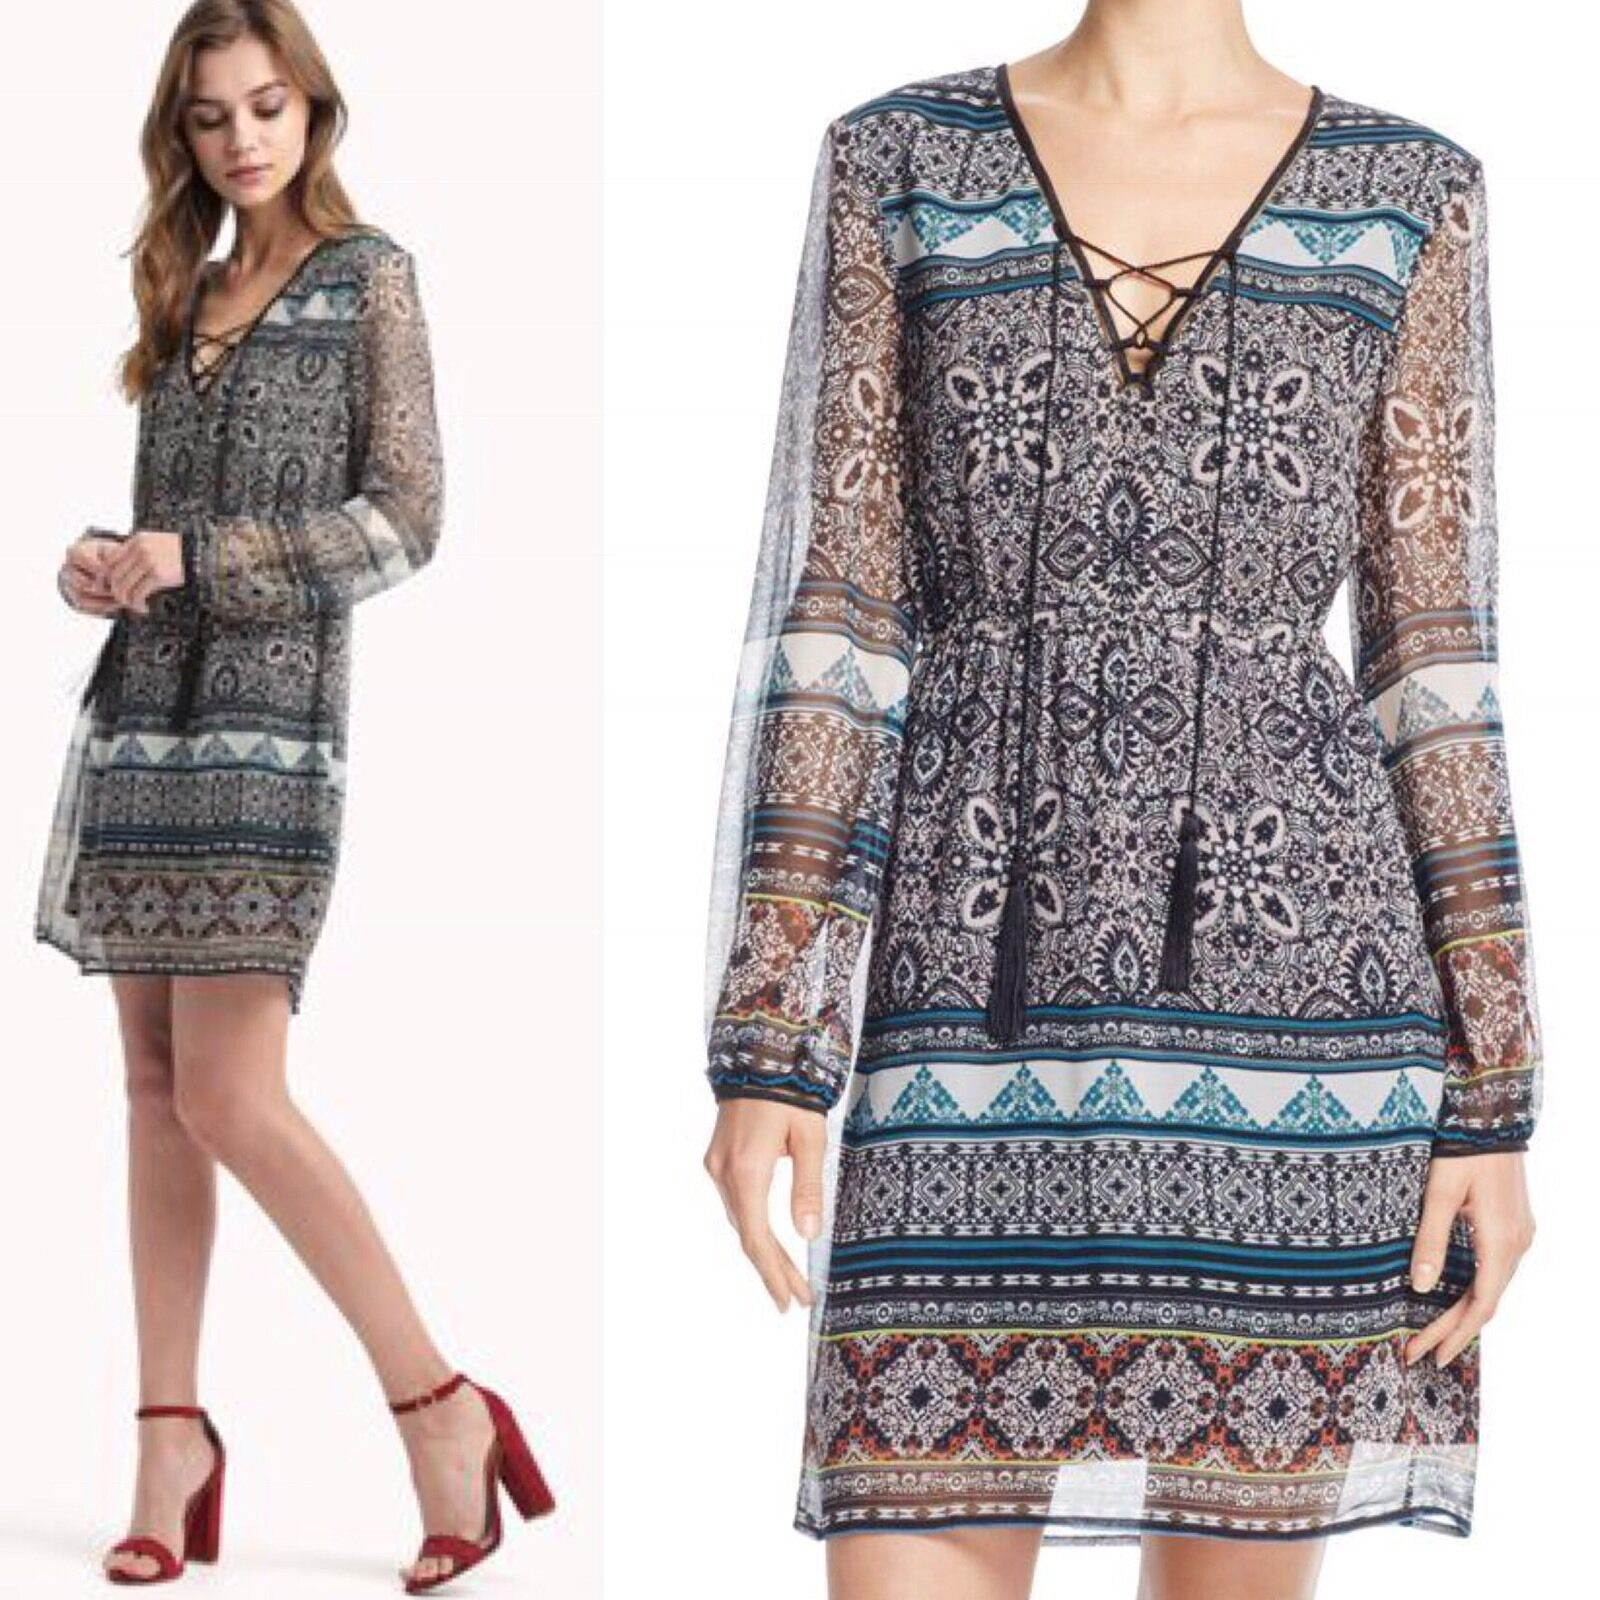 ELLA MOSS Jacinda Dress Size S NWT